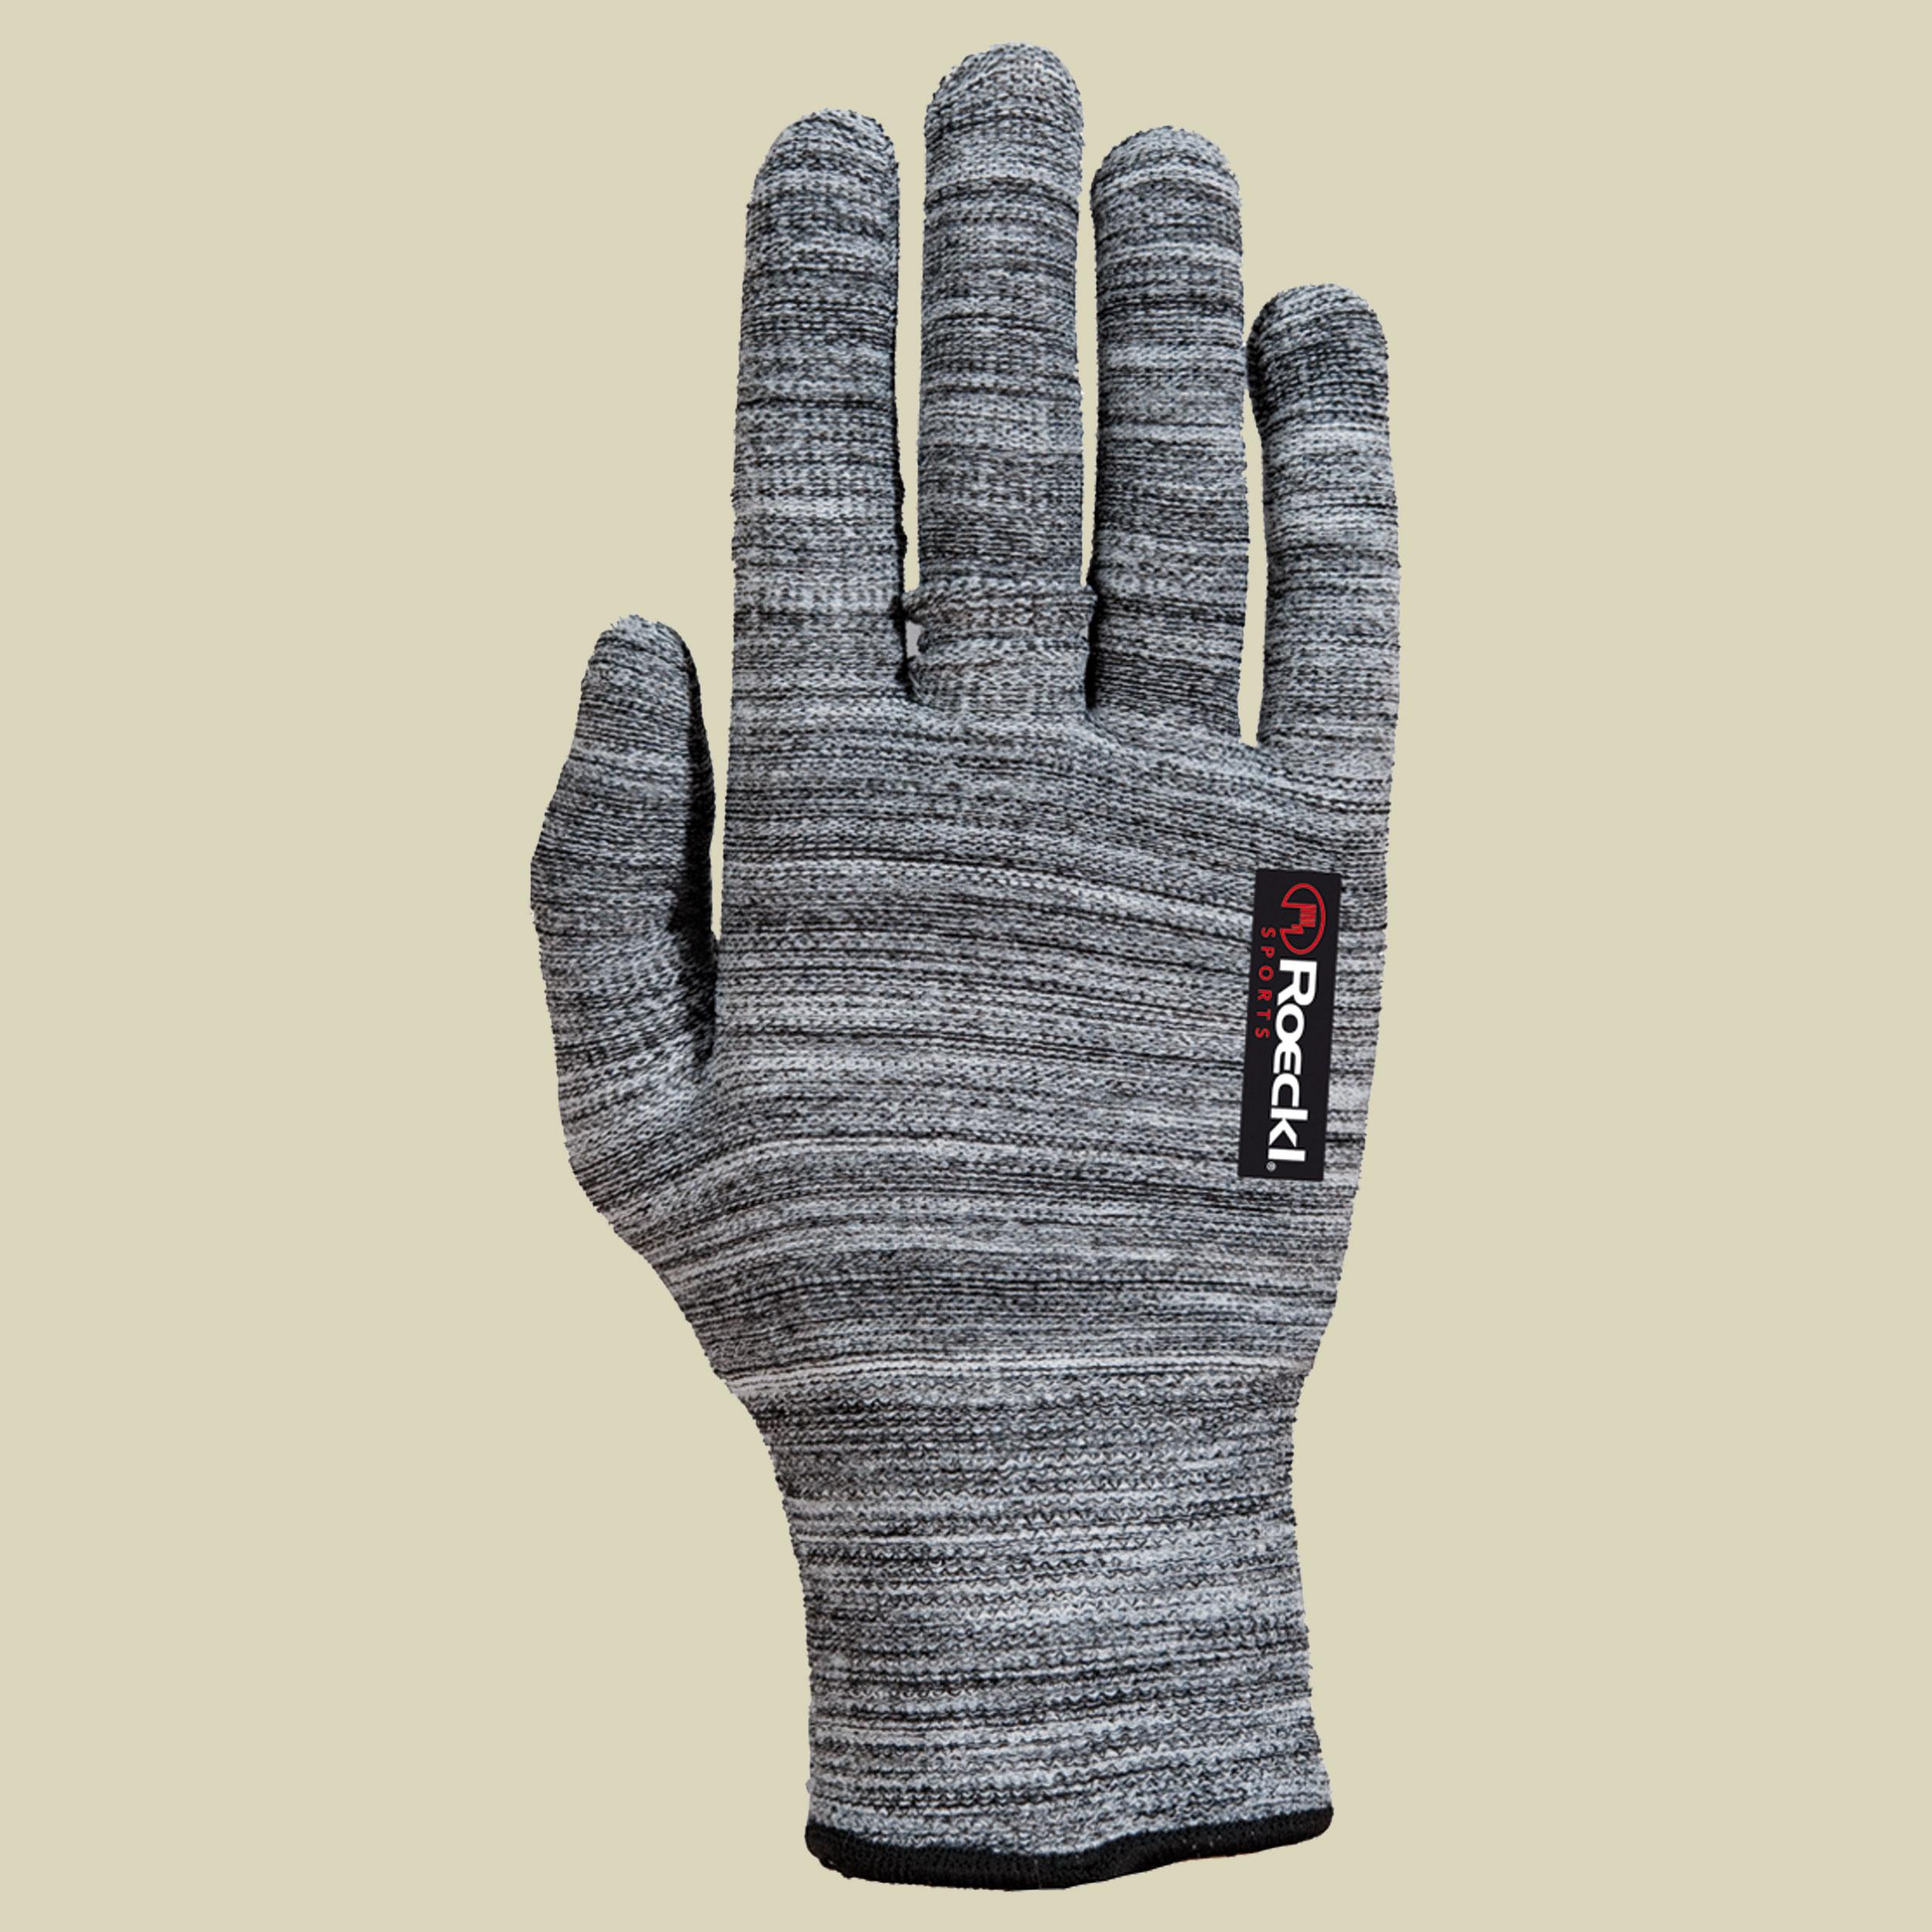 Roeckl Kalamaris Unterzieh-/Strickhandschuh Strick-Unterziehhandschuhe Unisex grau